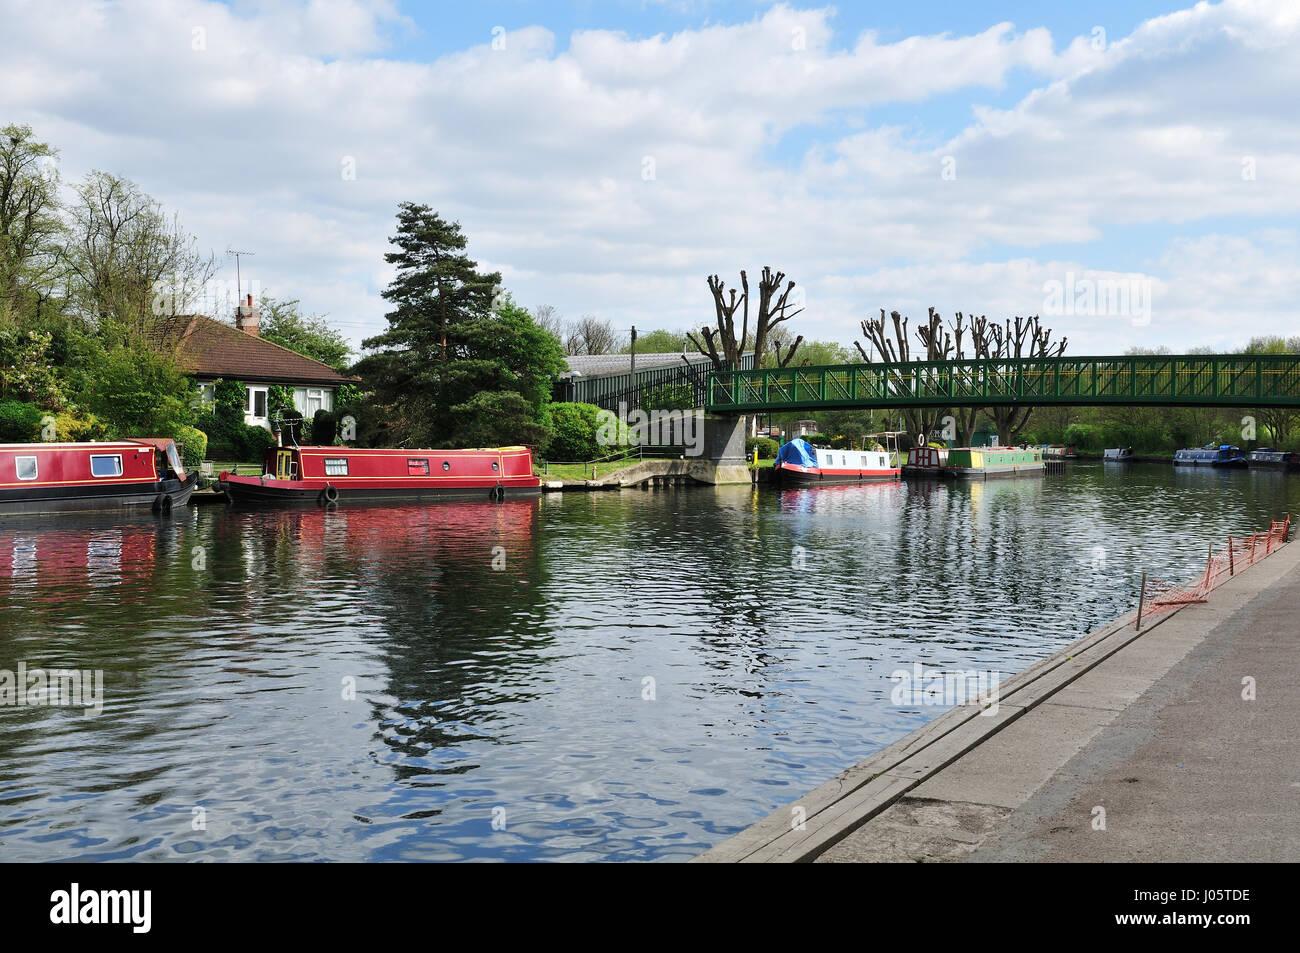 River Lea with narrowboats, near Springfield Park, North East London UK - Stock Image